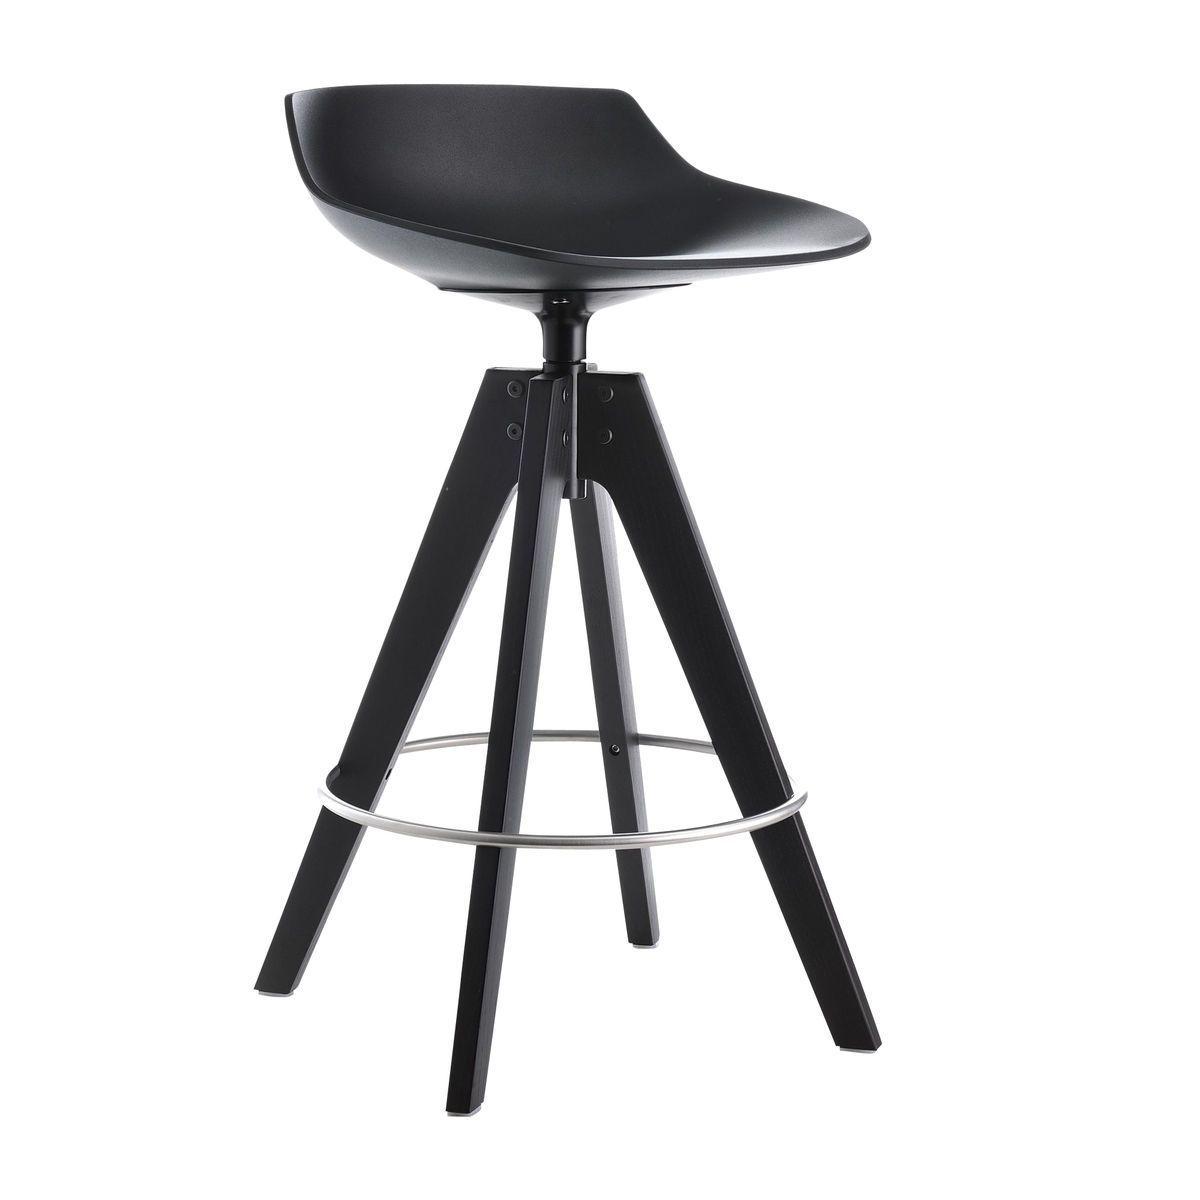 flow barhocker gestell eiche 65cm mdf italia barhocker. Black Bedroom Furniture Sets. Home Design Ideas